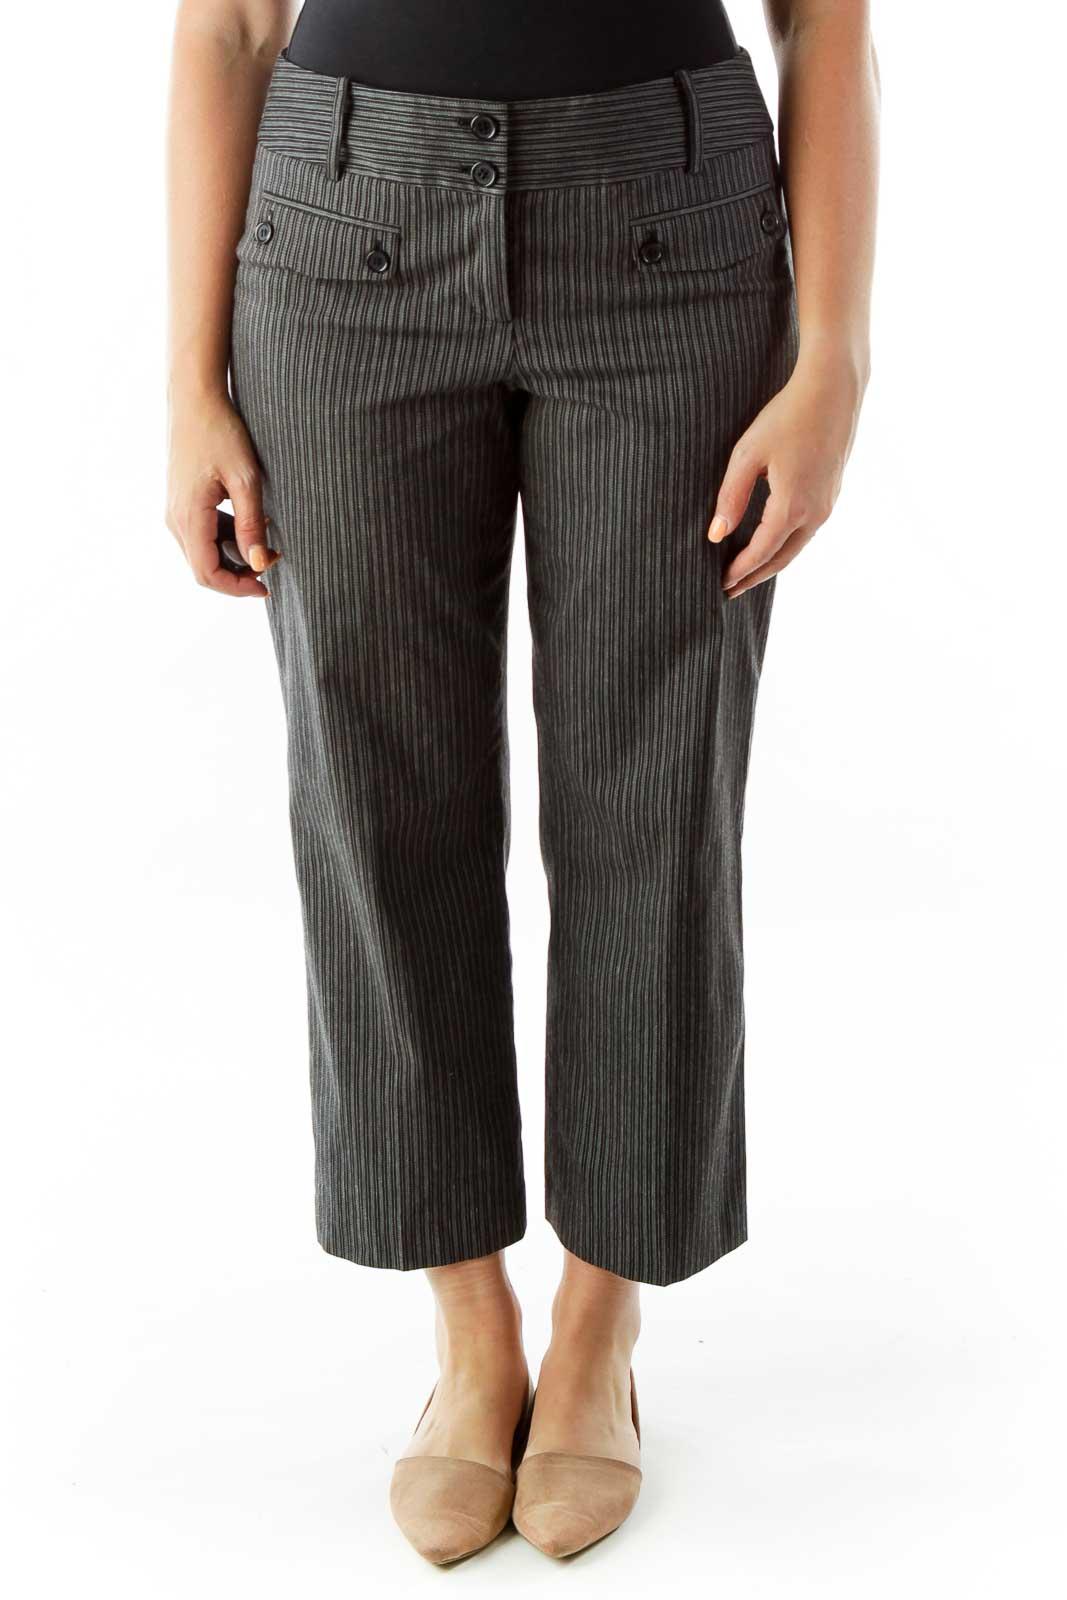 Black White Pin-Stripe Buttoned Slacks Front